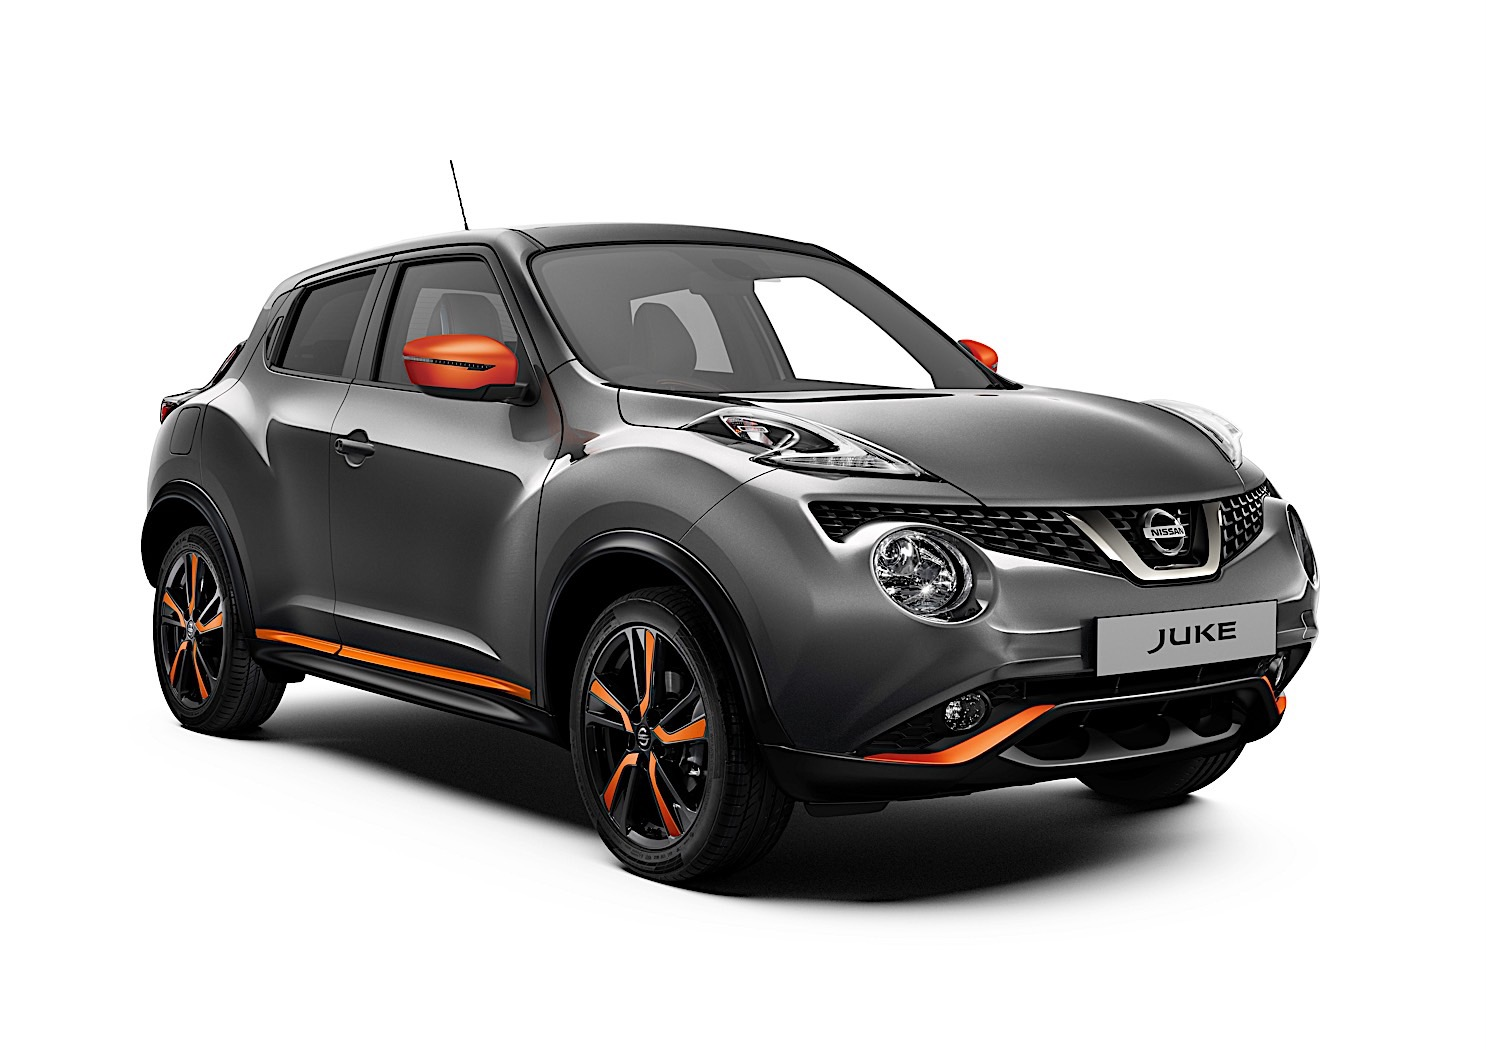 Nissan Upgrades Juke for the 2018 Geneva Motor Show - autoevolution